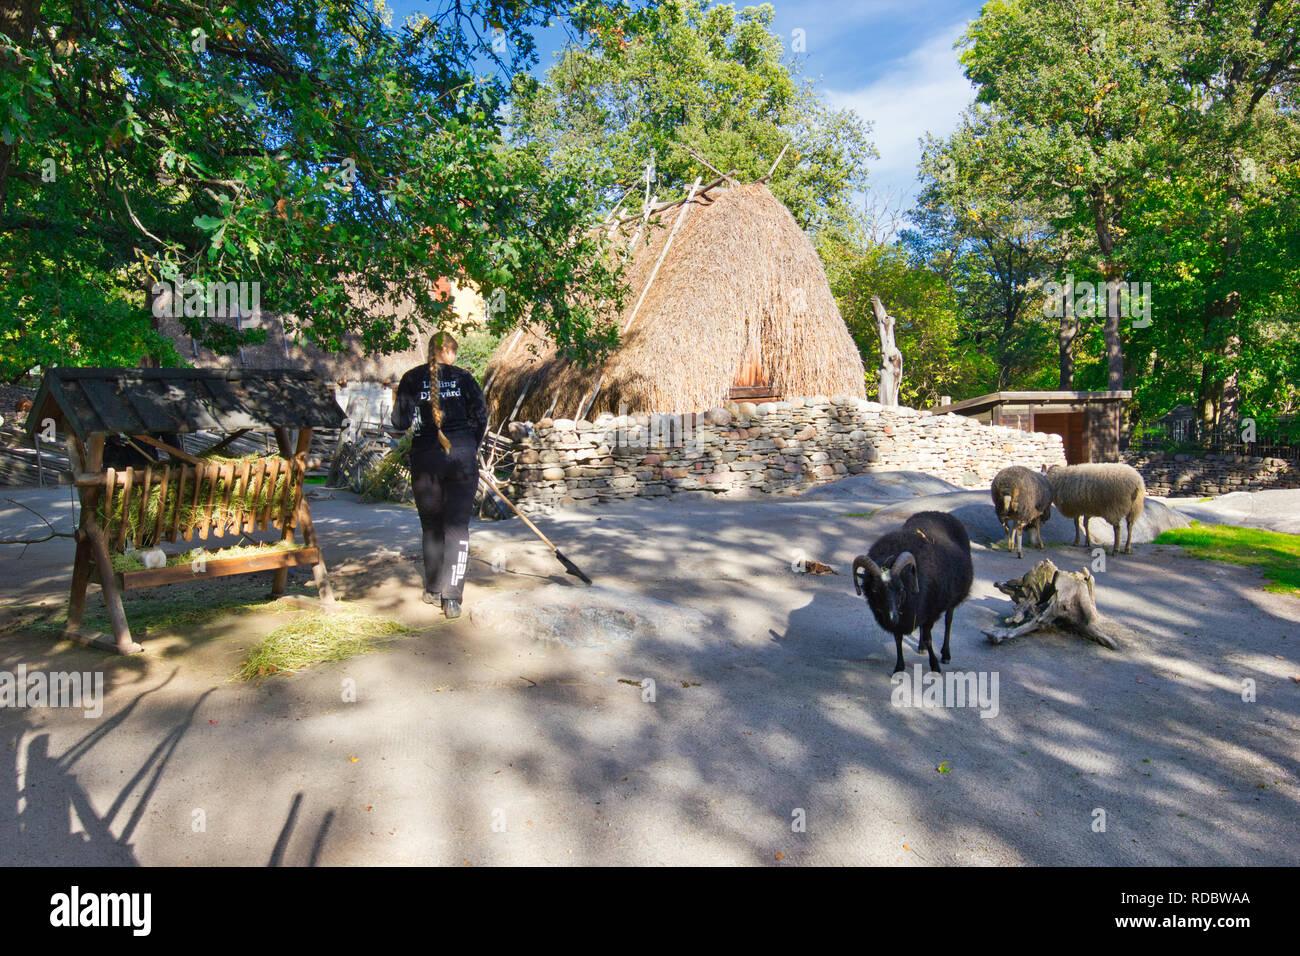 Summer Pasture Farm, Skansen open-air museum, Djurgarden, Stockholm, Sweden, Scandinavia - Stock Image